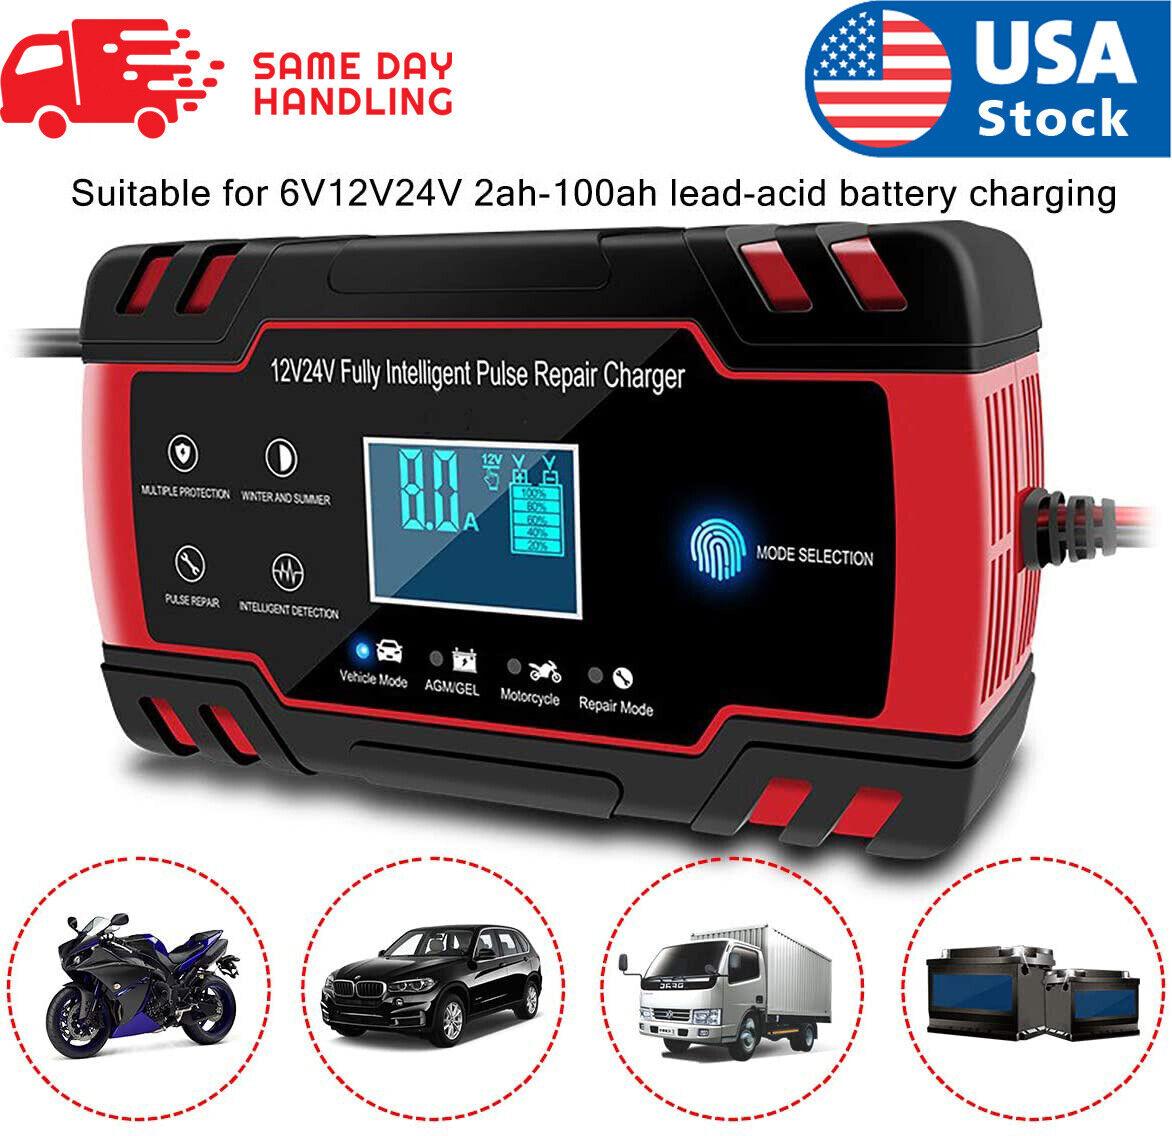 LCD Car ATV 12/24V 6-150Ah Motorcycle Pulse Repair Battery Charger AGM Automatic Automotive Tools & Supplies